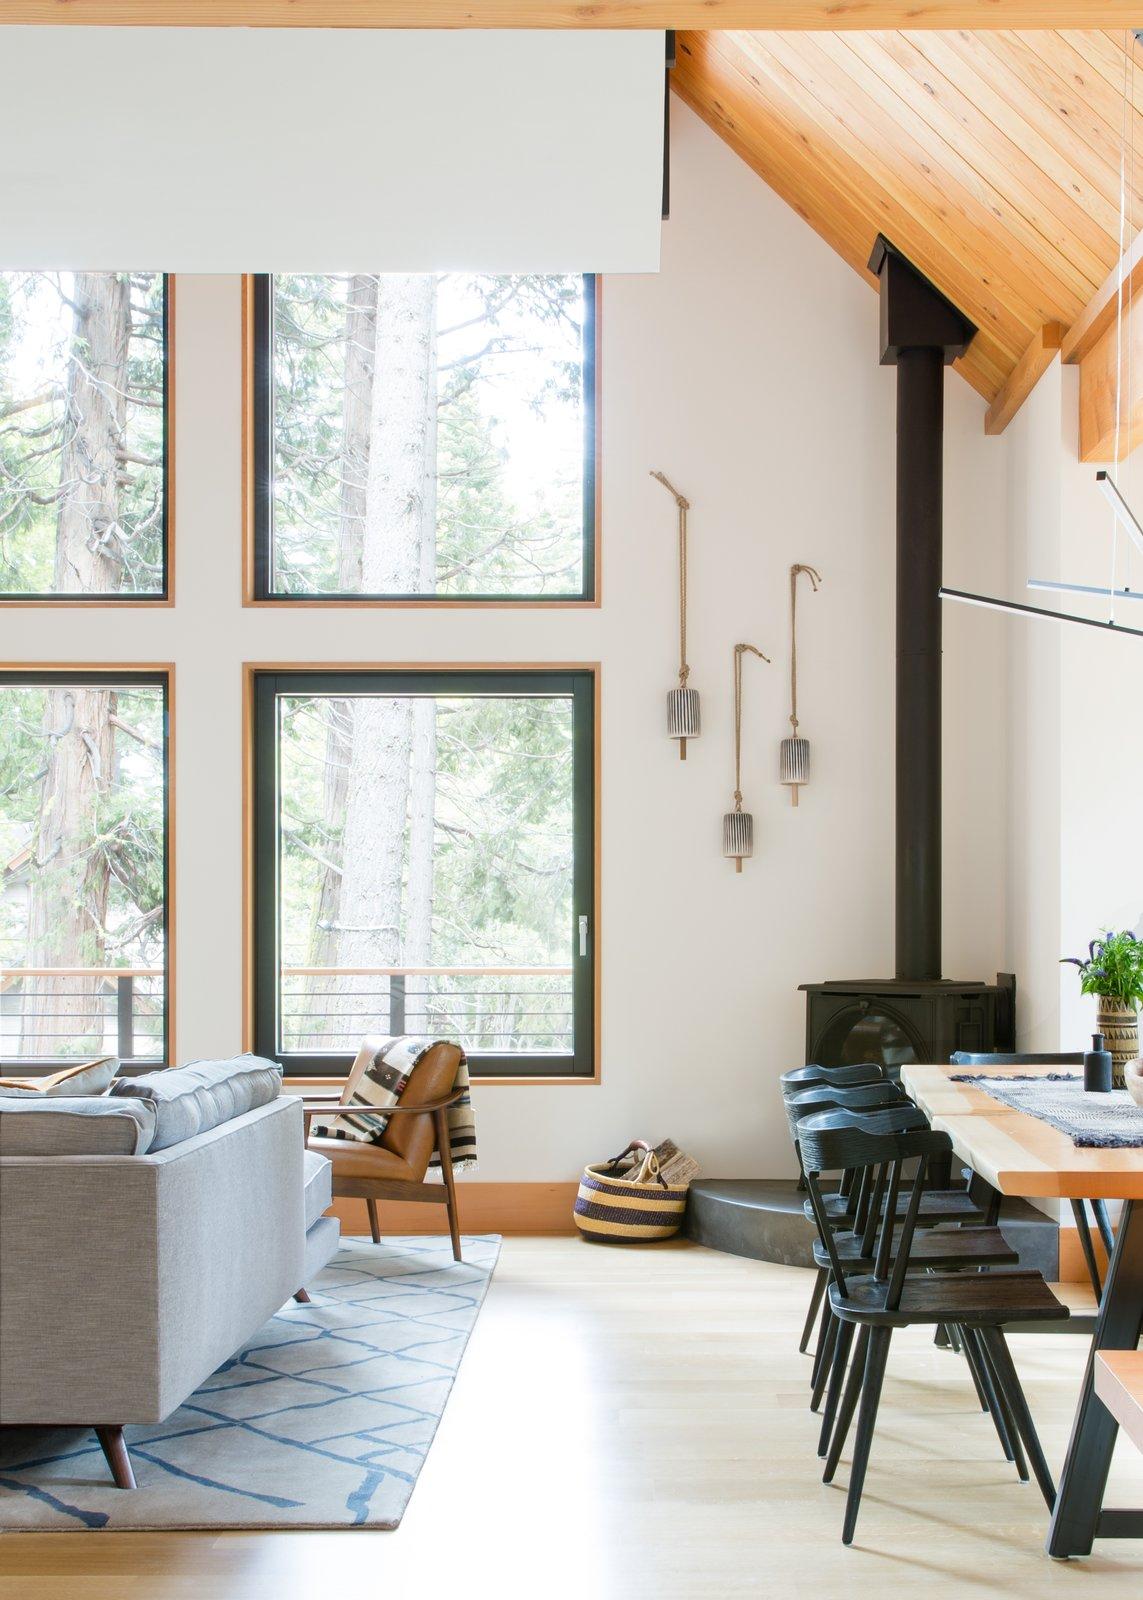 Living Room, Sectional, Corner Fireplace, and Medium Hardwood Floor  Woodsy Tahoe Cabin by Regan Baker Design